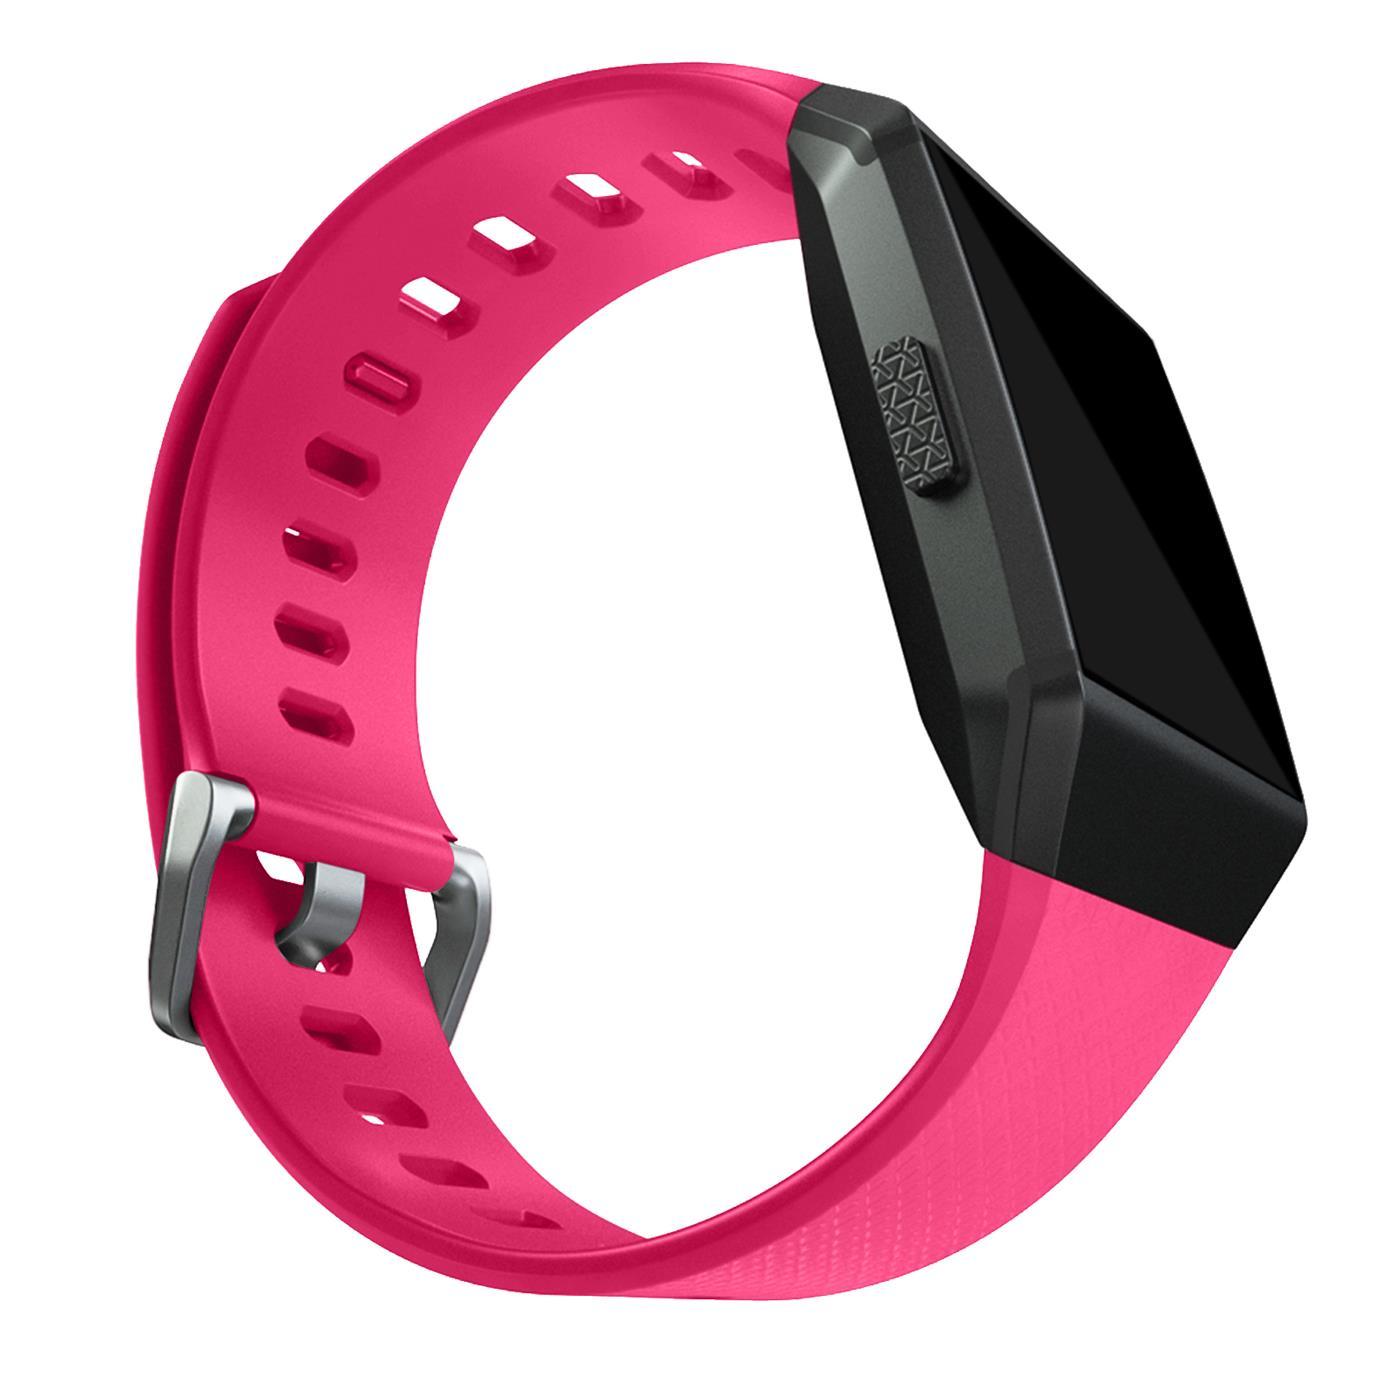 Fitbit-Ionic-Gr-S-L-Ersatz-Silikon-Armband-Uhren-Sport-Band-Fitness-Tracker Indexbild 17